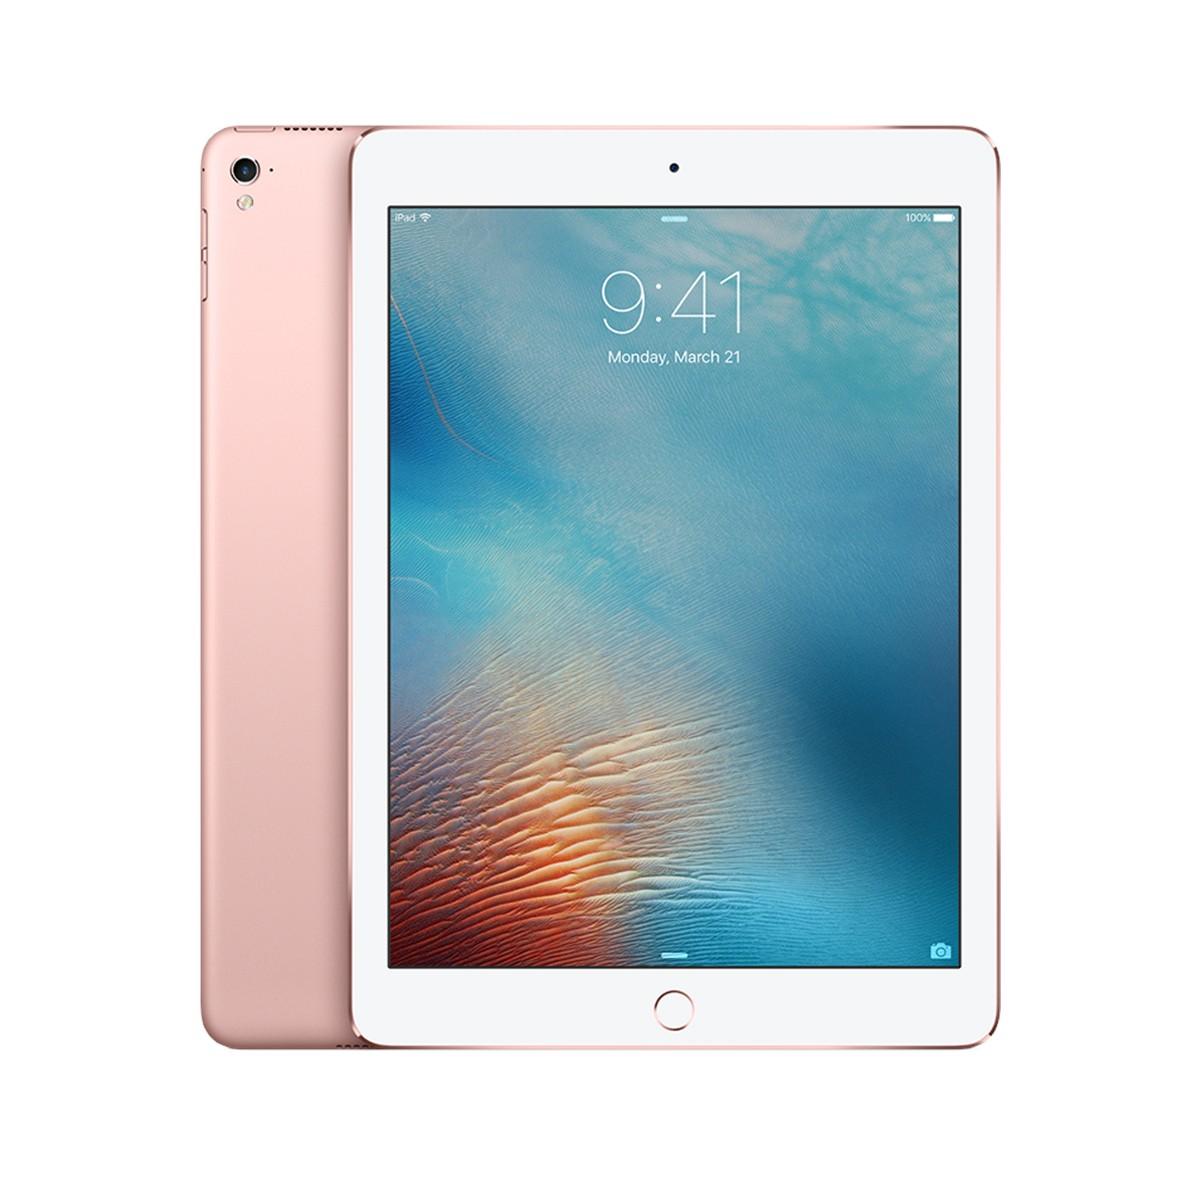 "Apple iPad Pro 9,7"" Wifi - Cellular 128GB - Růžově zlatý mlyl2fd/a"